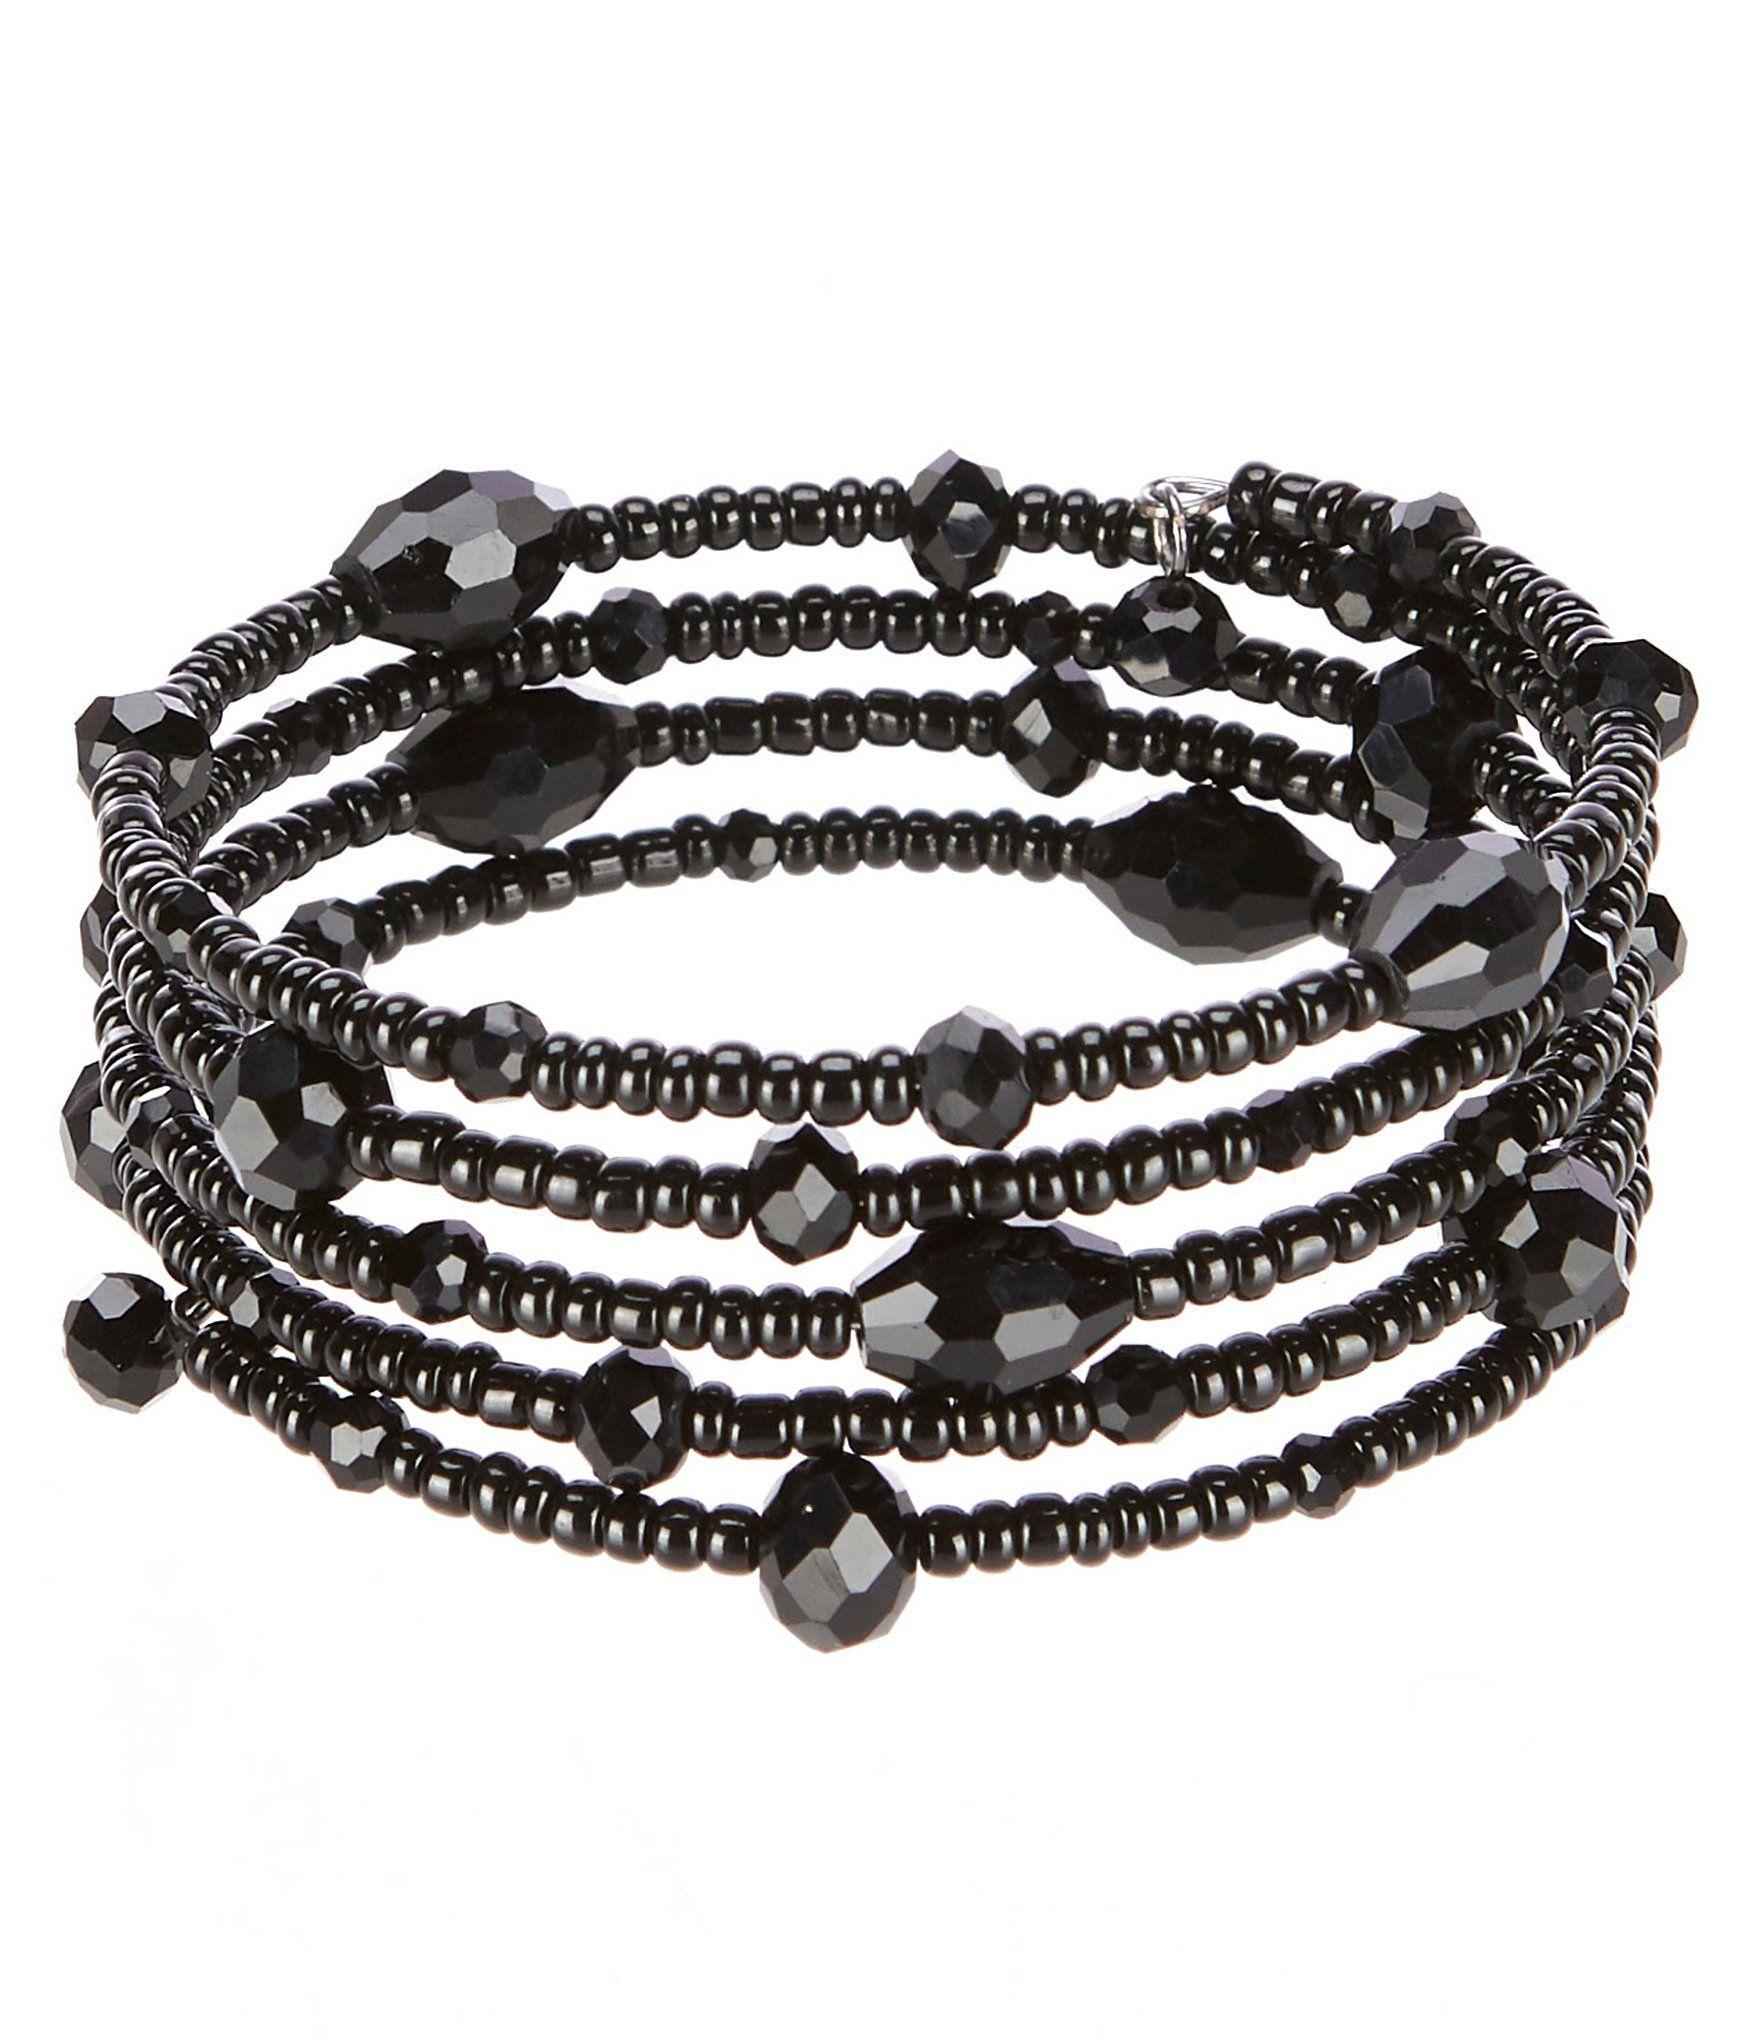 Gemma Layne Jet Bead Coil Bracelet - Jet N/A